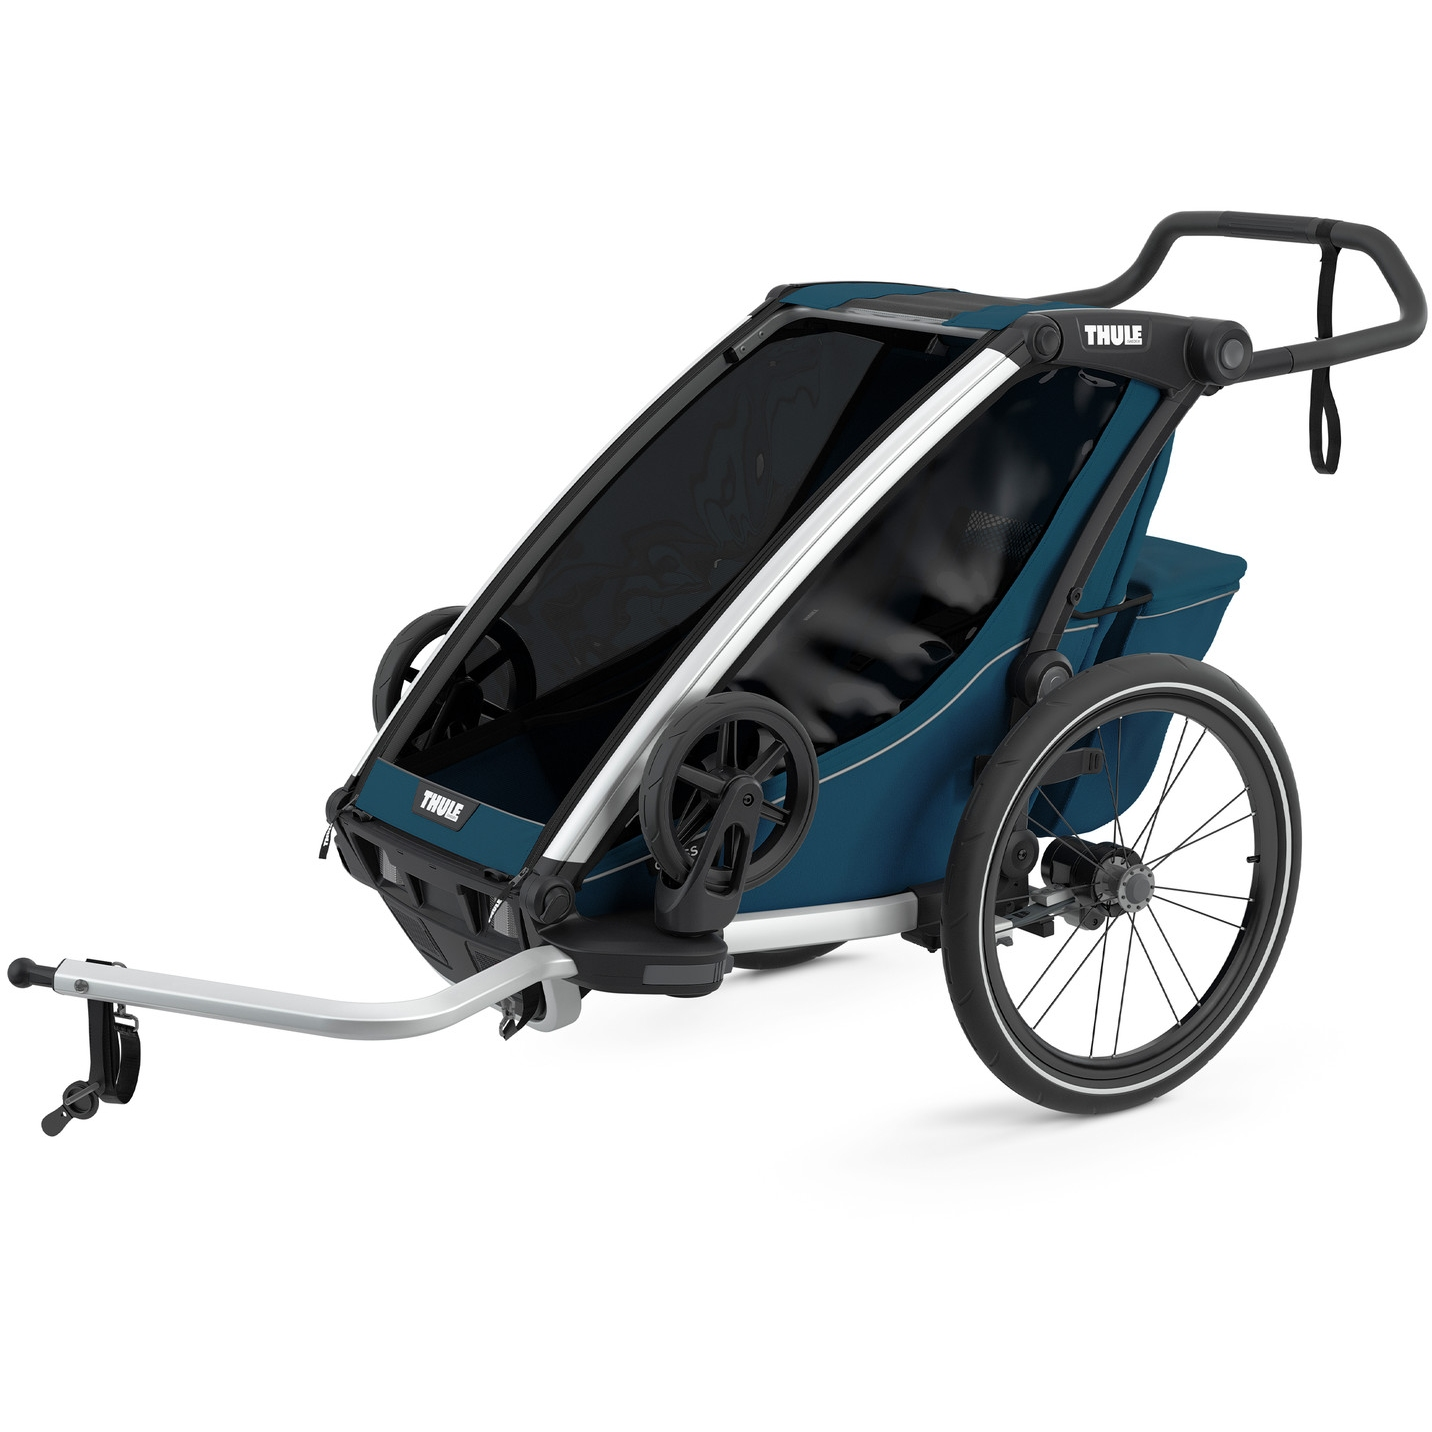 Foto de Thule Chariot Cross 1 - Remolque de bicicleta para 1 niño - majolica blue